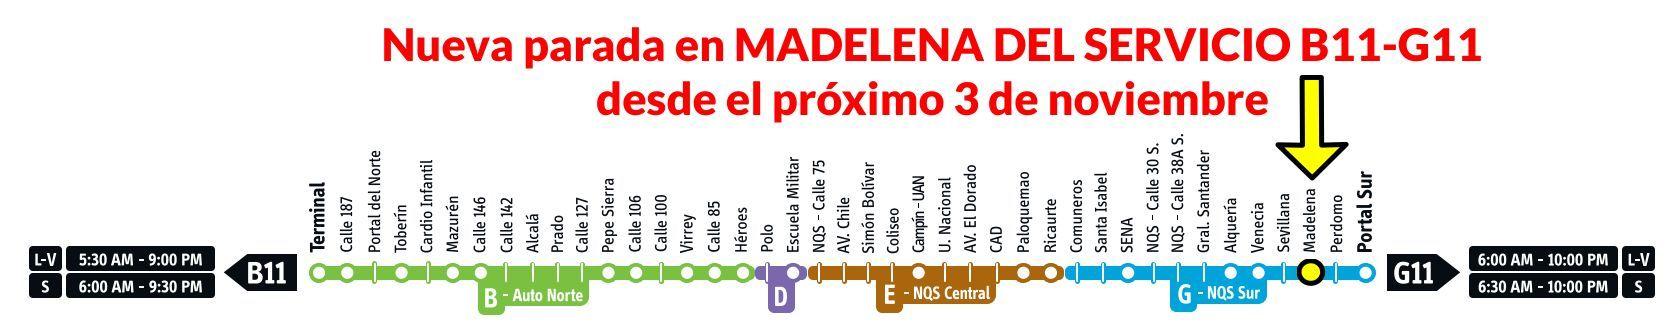 Recorrido del servicio expreso B11-G11 con parada en Madelena